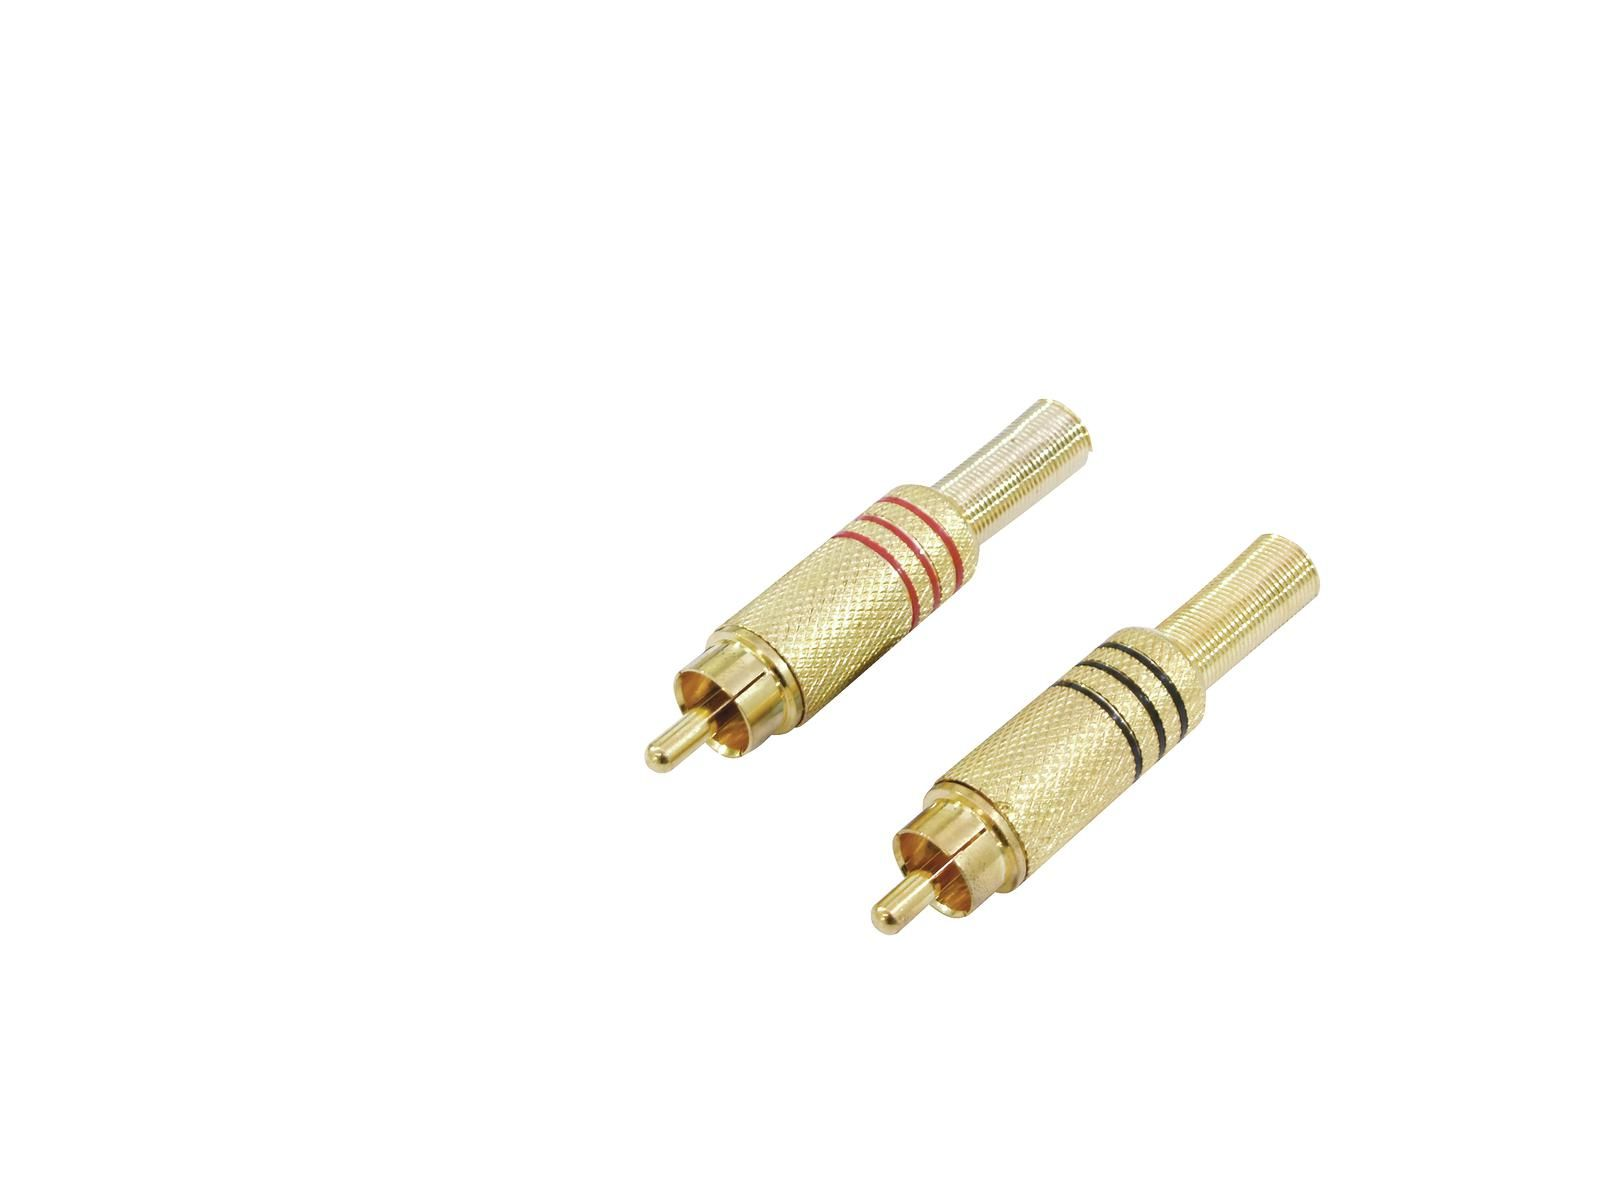 omnitronic-cinch-stecker-vergoldet-7mm-rt-sw-2x